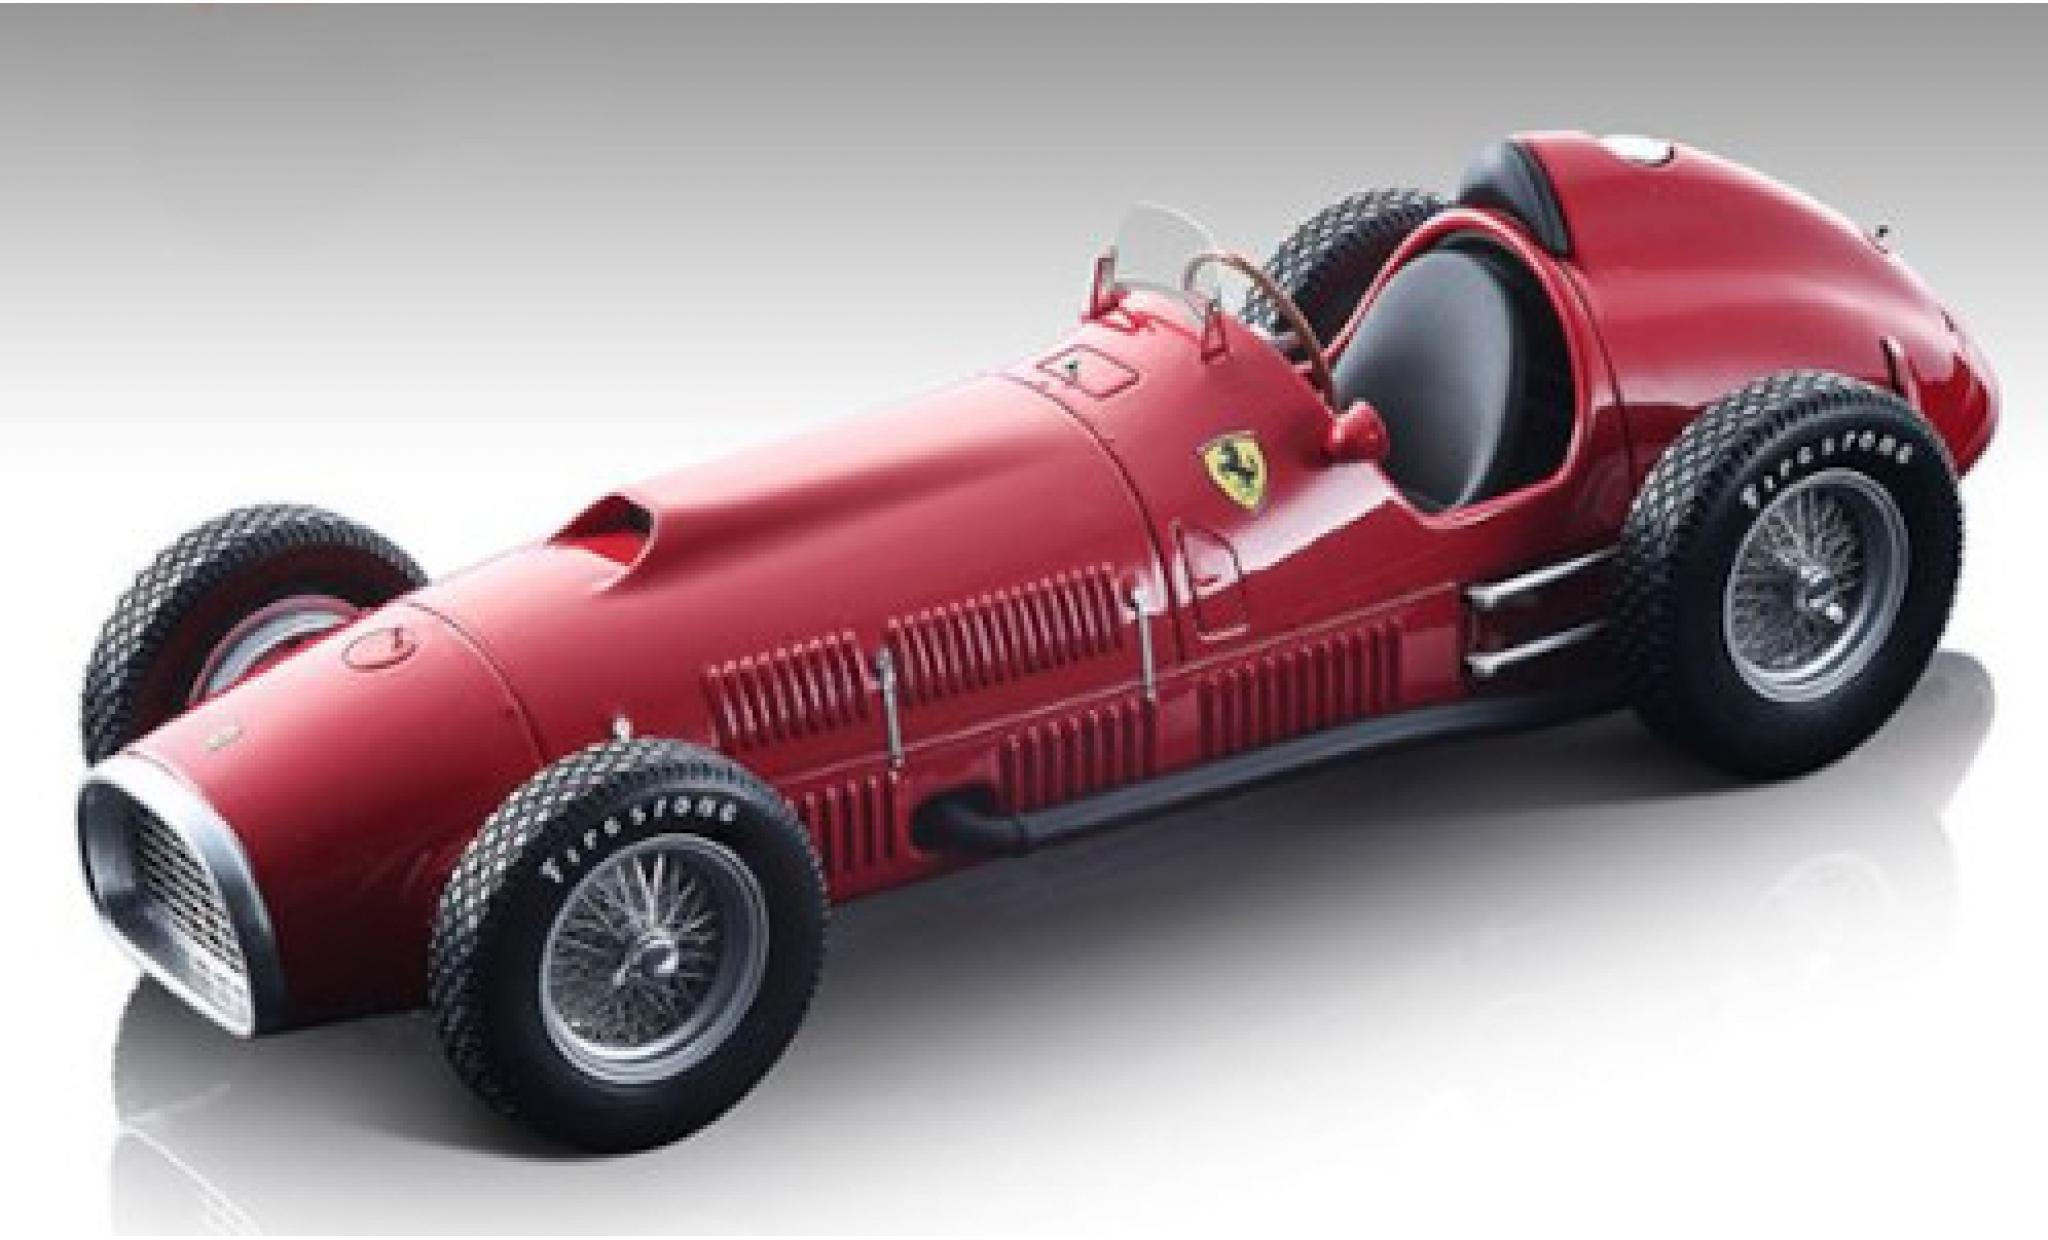 Ferrari 375 1/18 Tecnomodel Indianapolis rouge Scuderia Automobil Weltmeisterschaft Indianapolis 500 1952 Pressefahrzeug